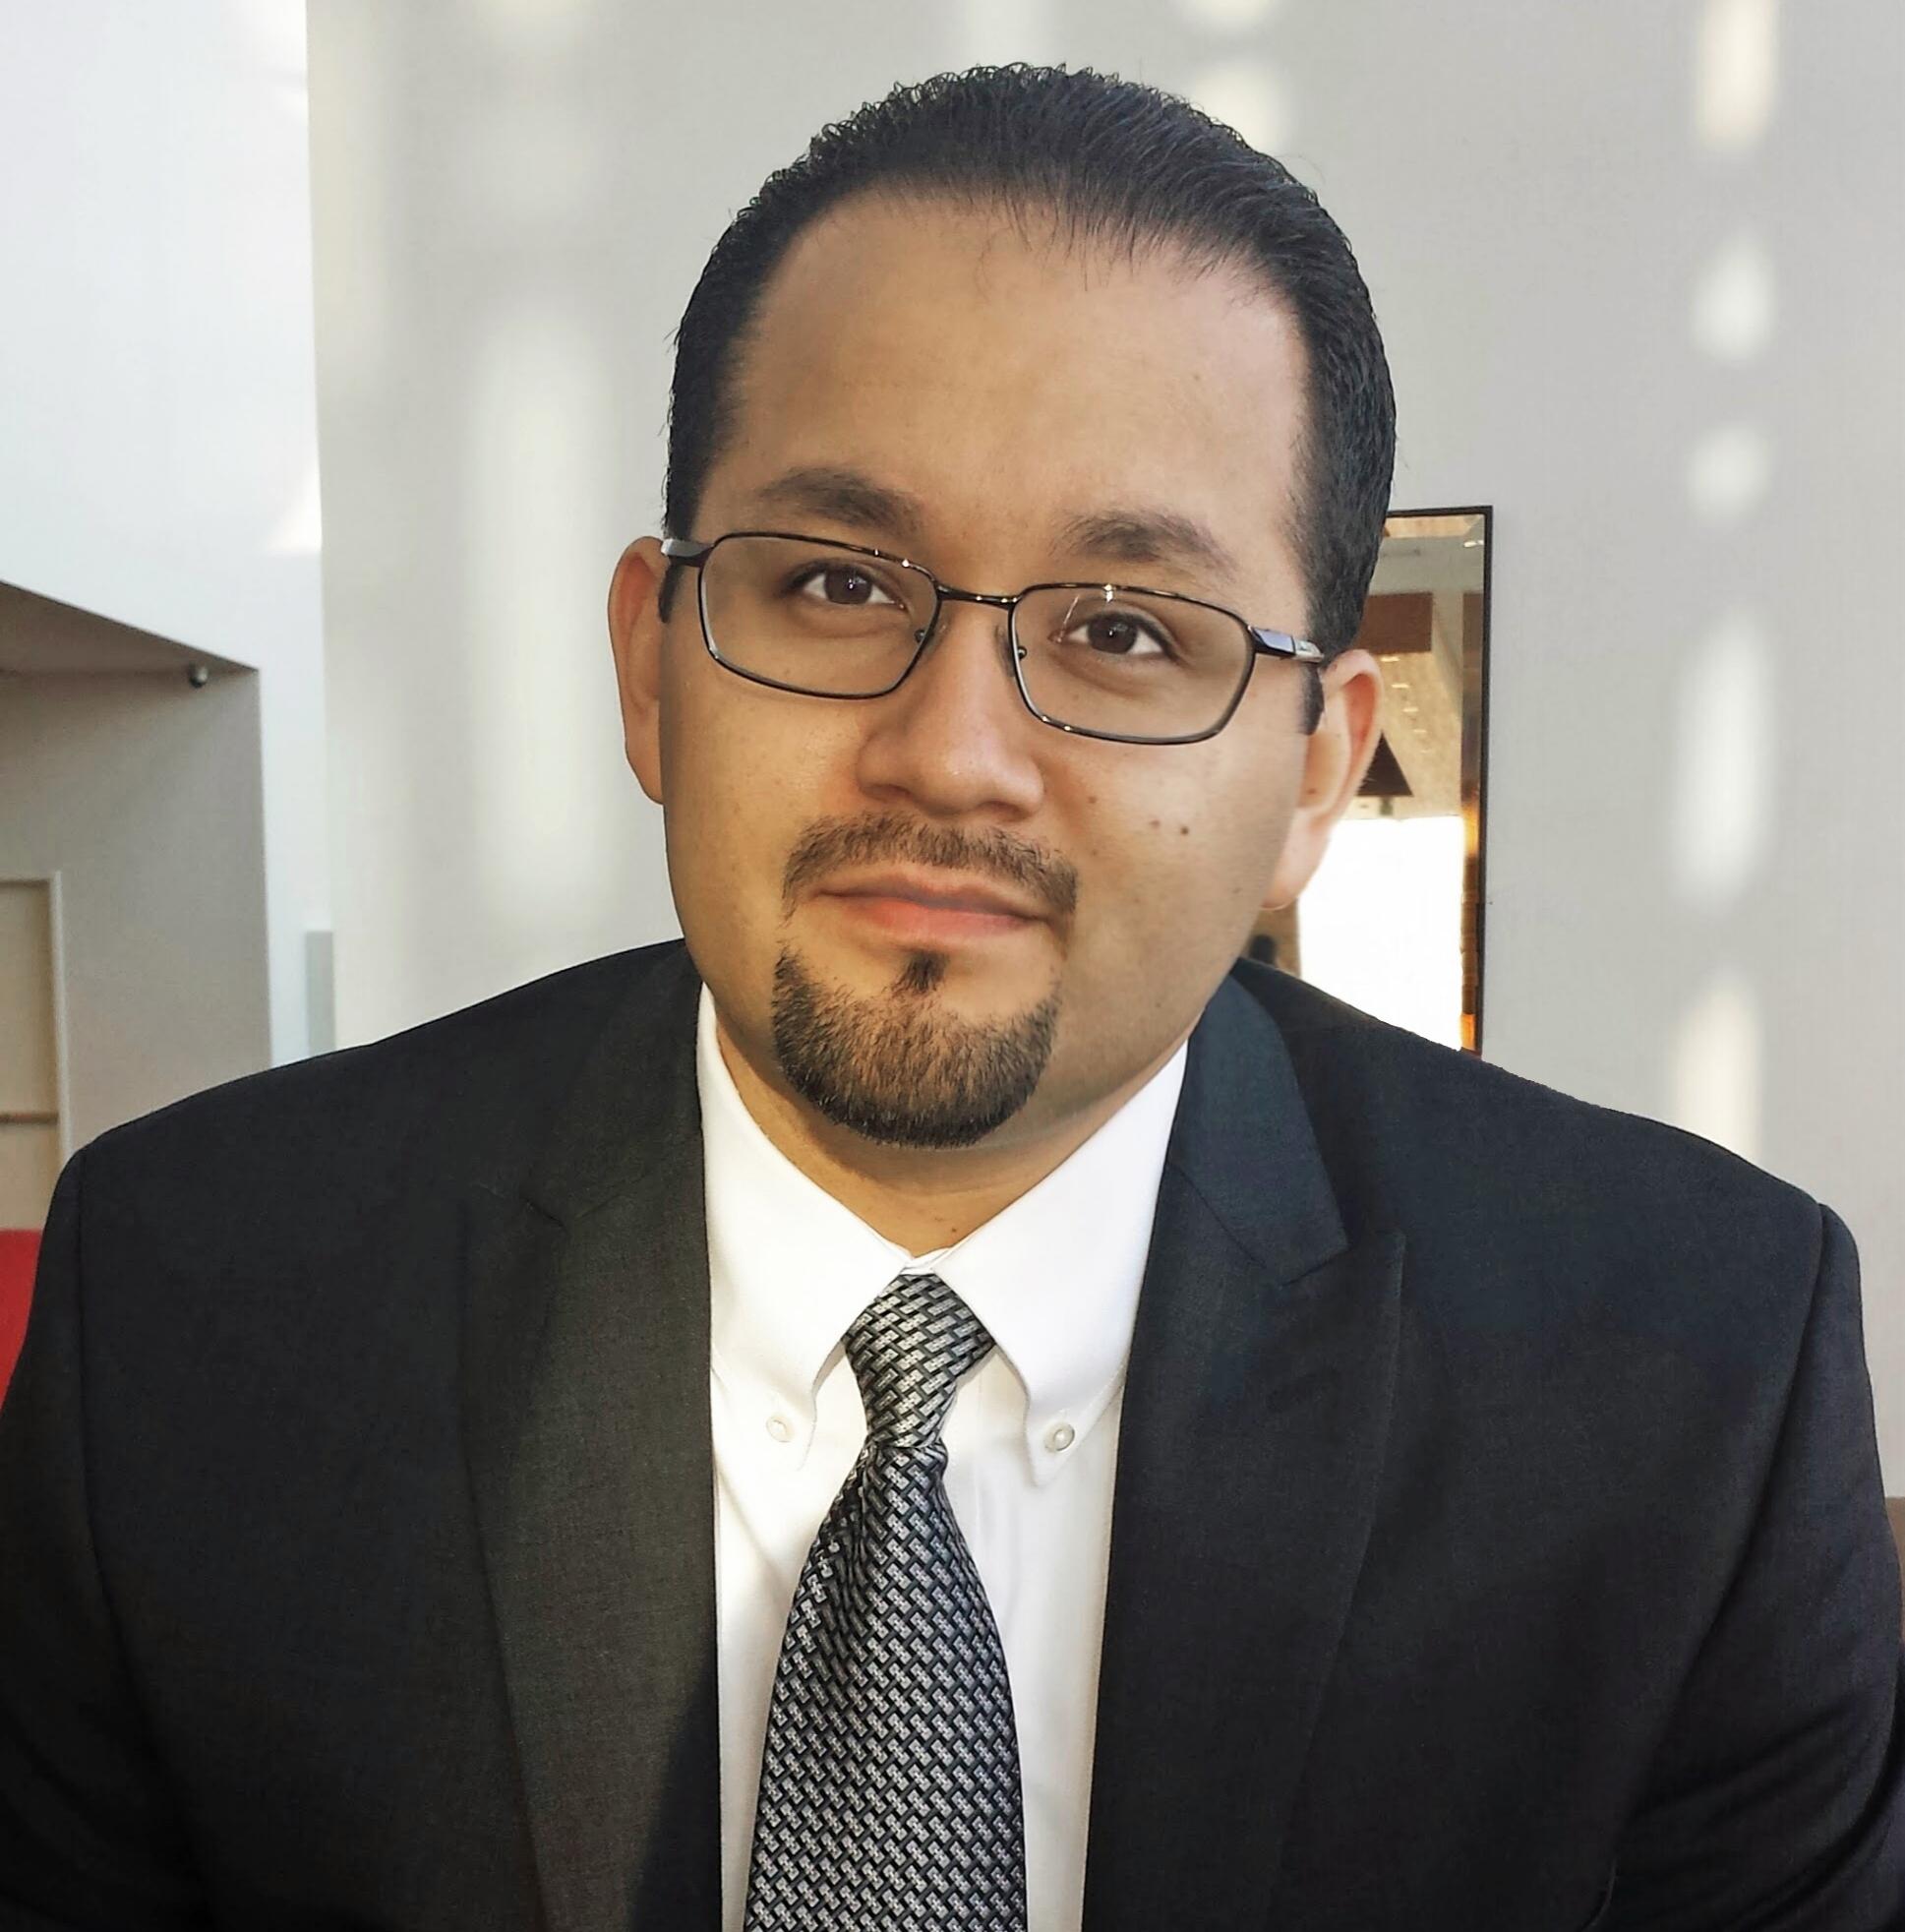 Hector Aguilar | Regulatory Compliance Advisor